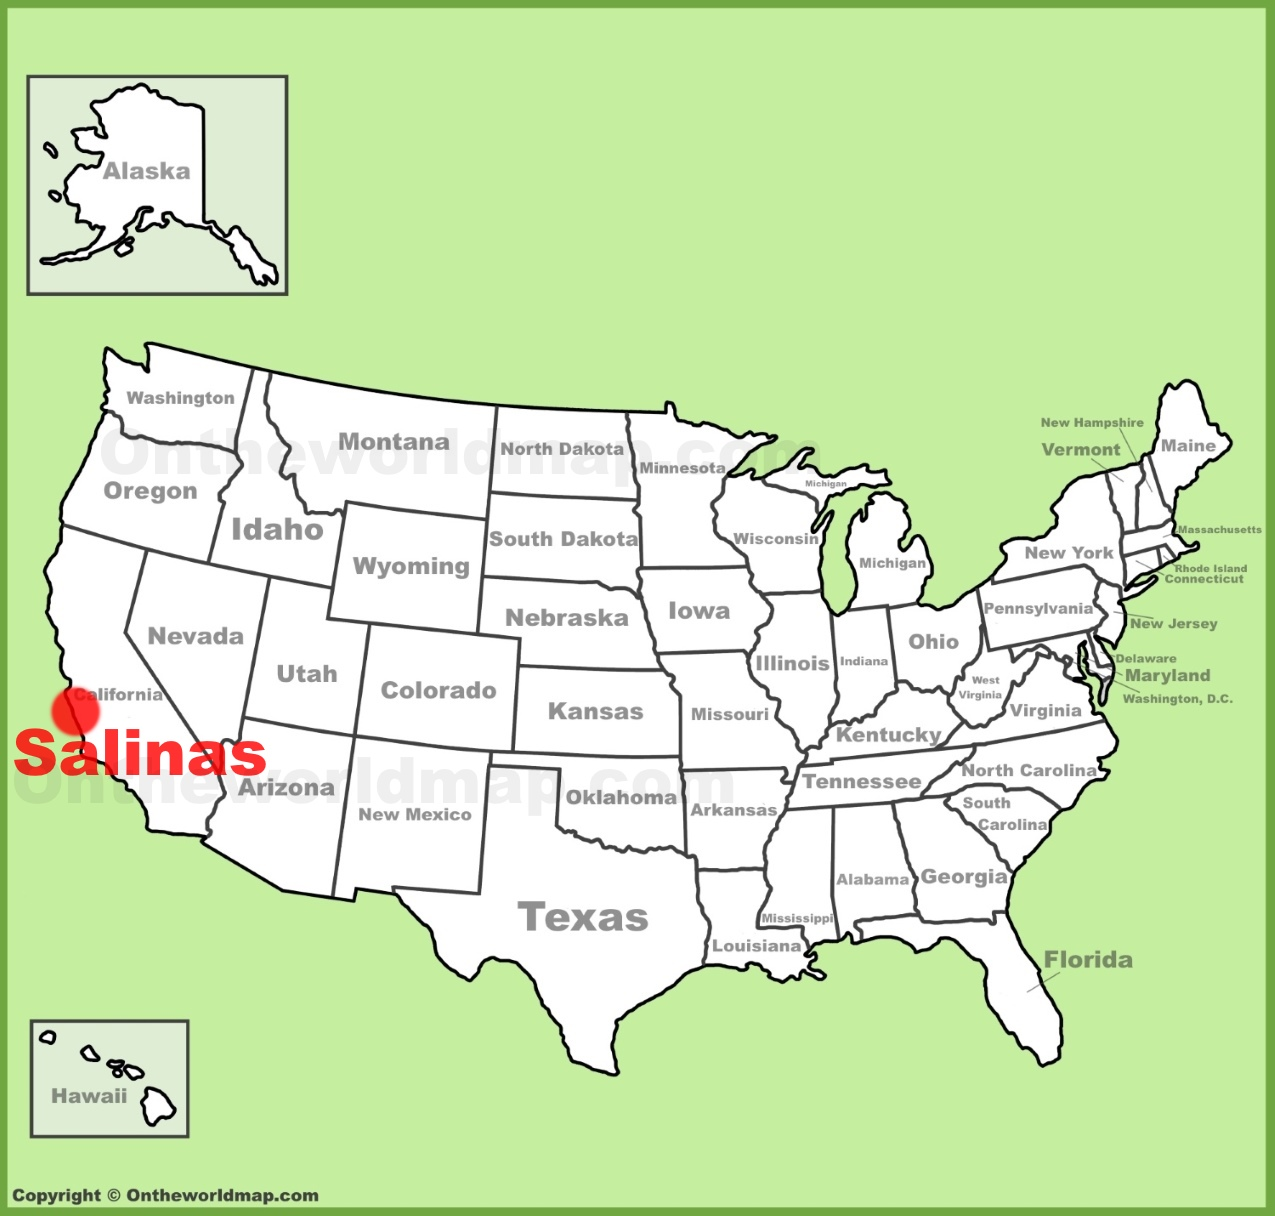 Salinas location on the US Map